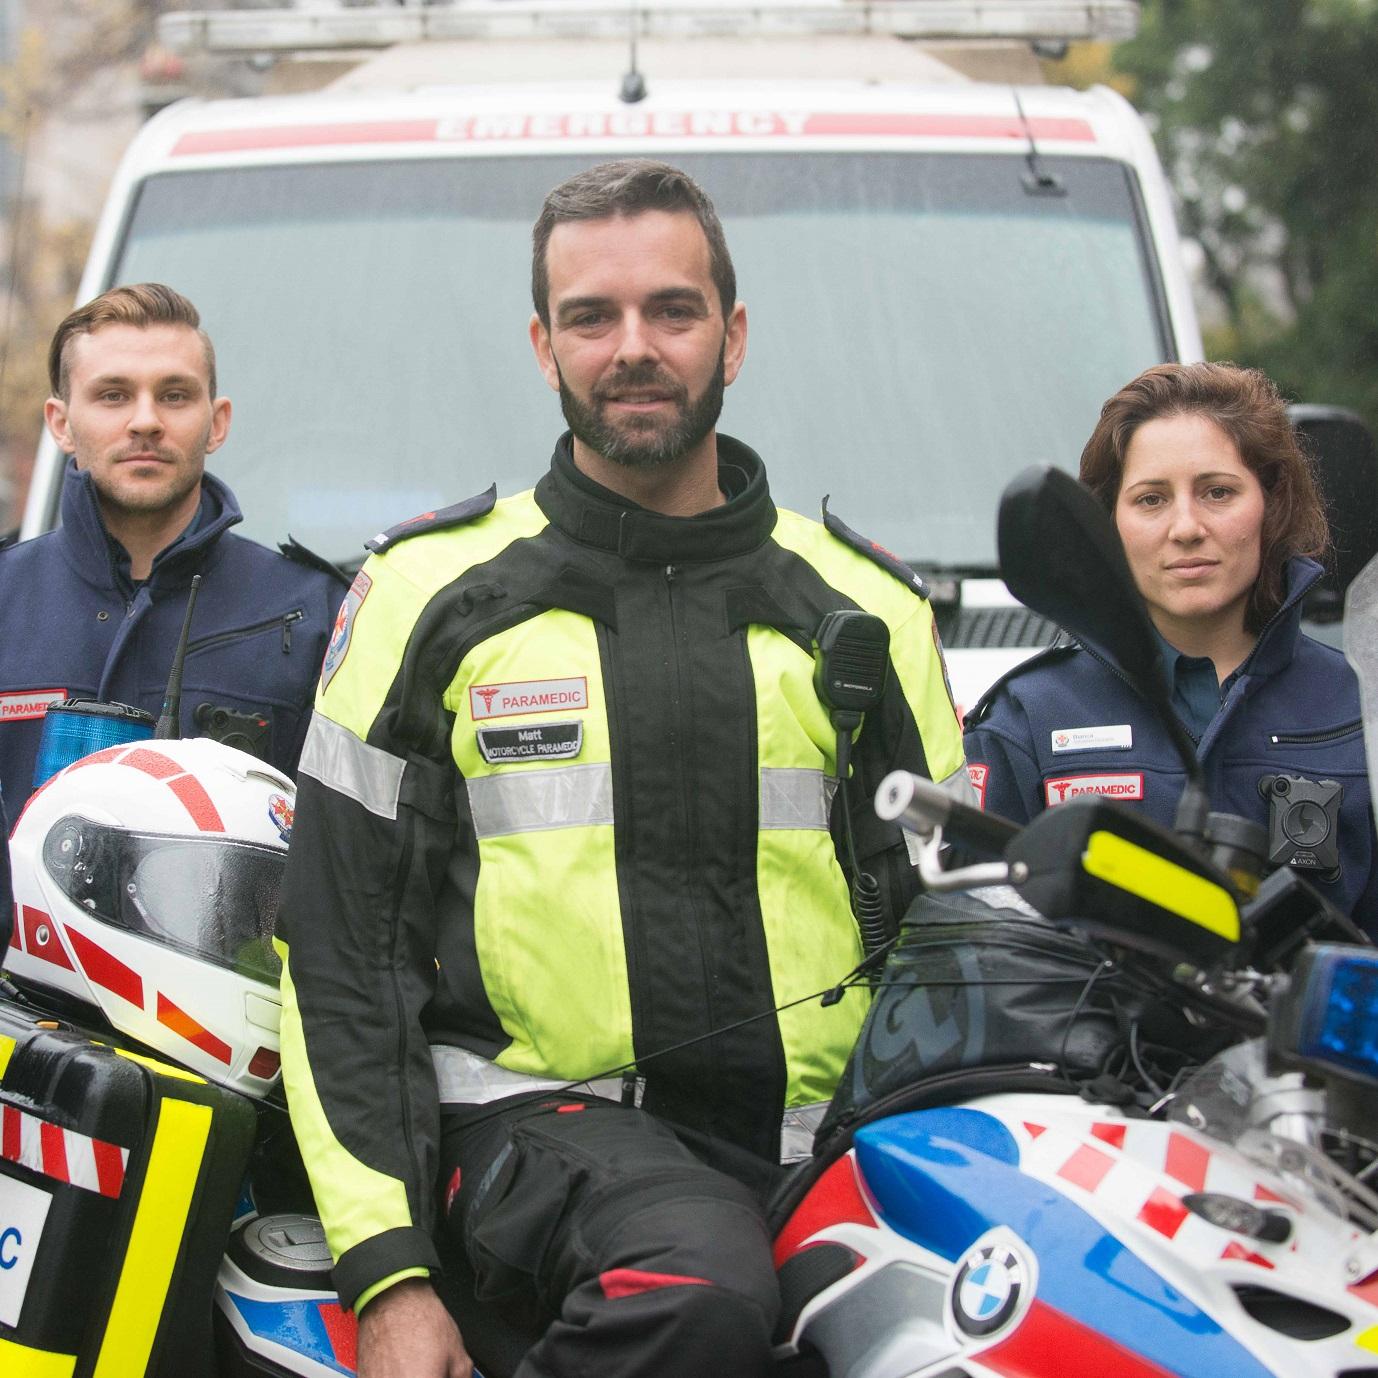 Backing our paramedics -